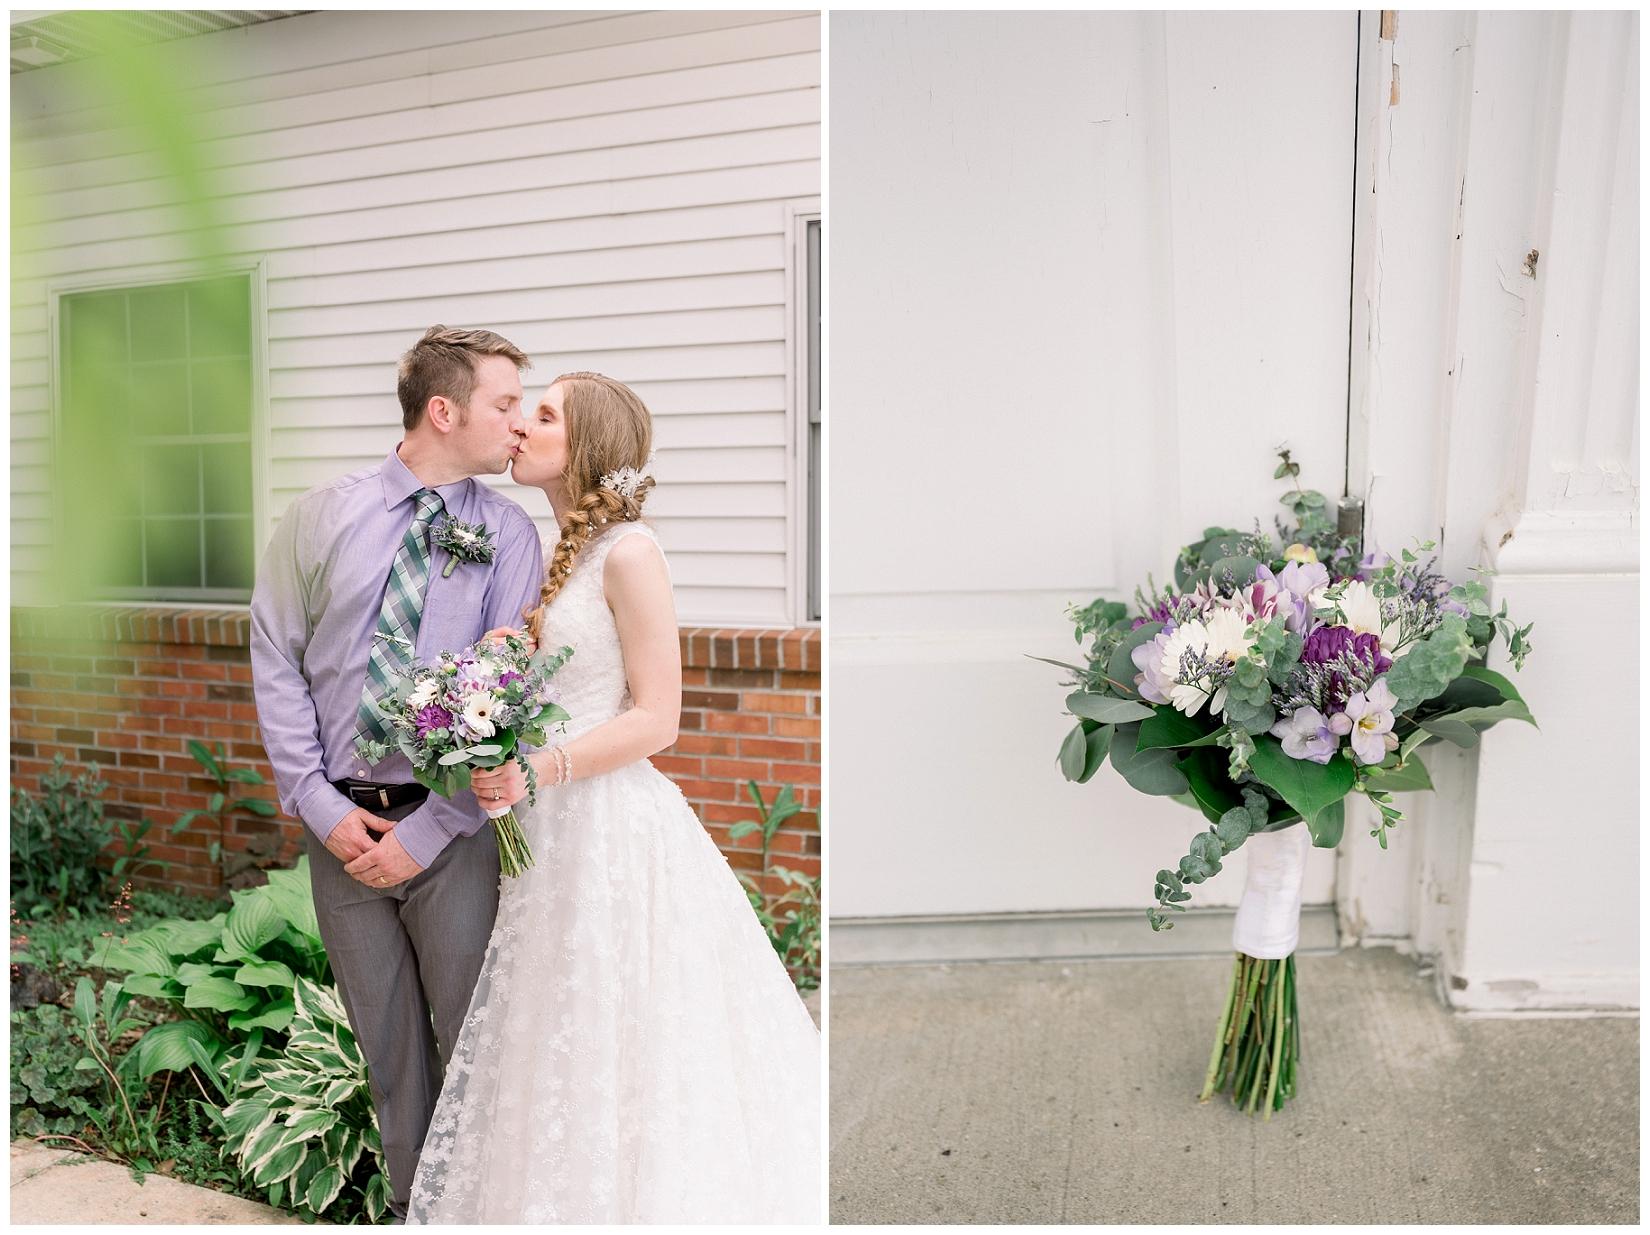 cat-alkire-wedding-photographer-indiana-chicago-indianapolis-fort-wayne_1320.jpg